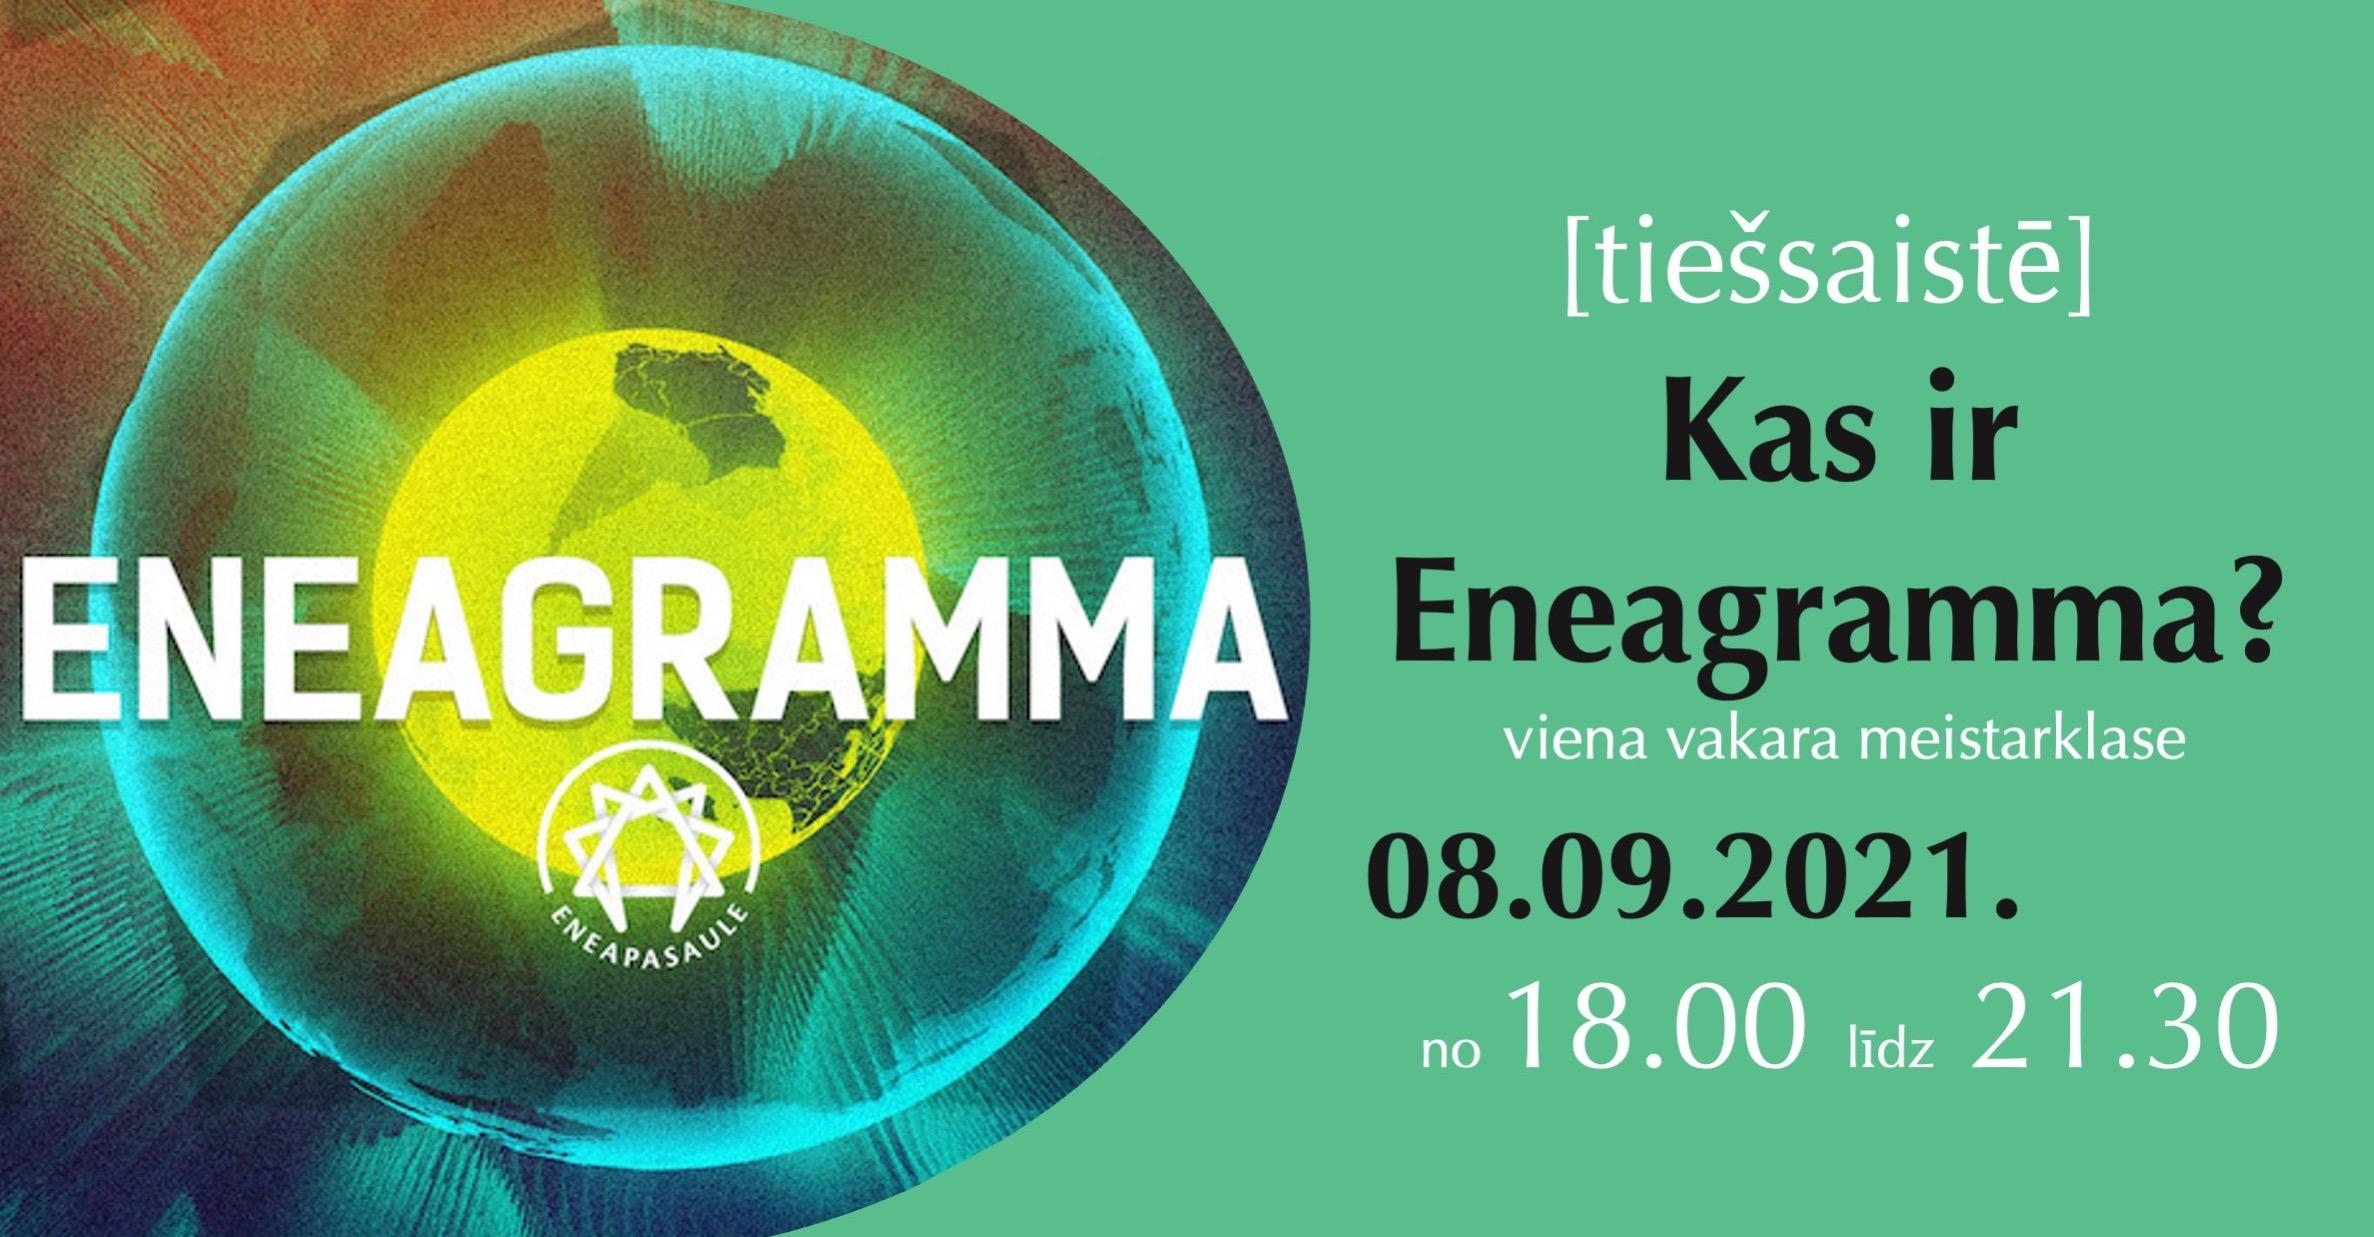 Kas ir Eneagramma